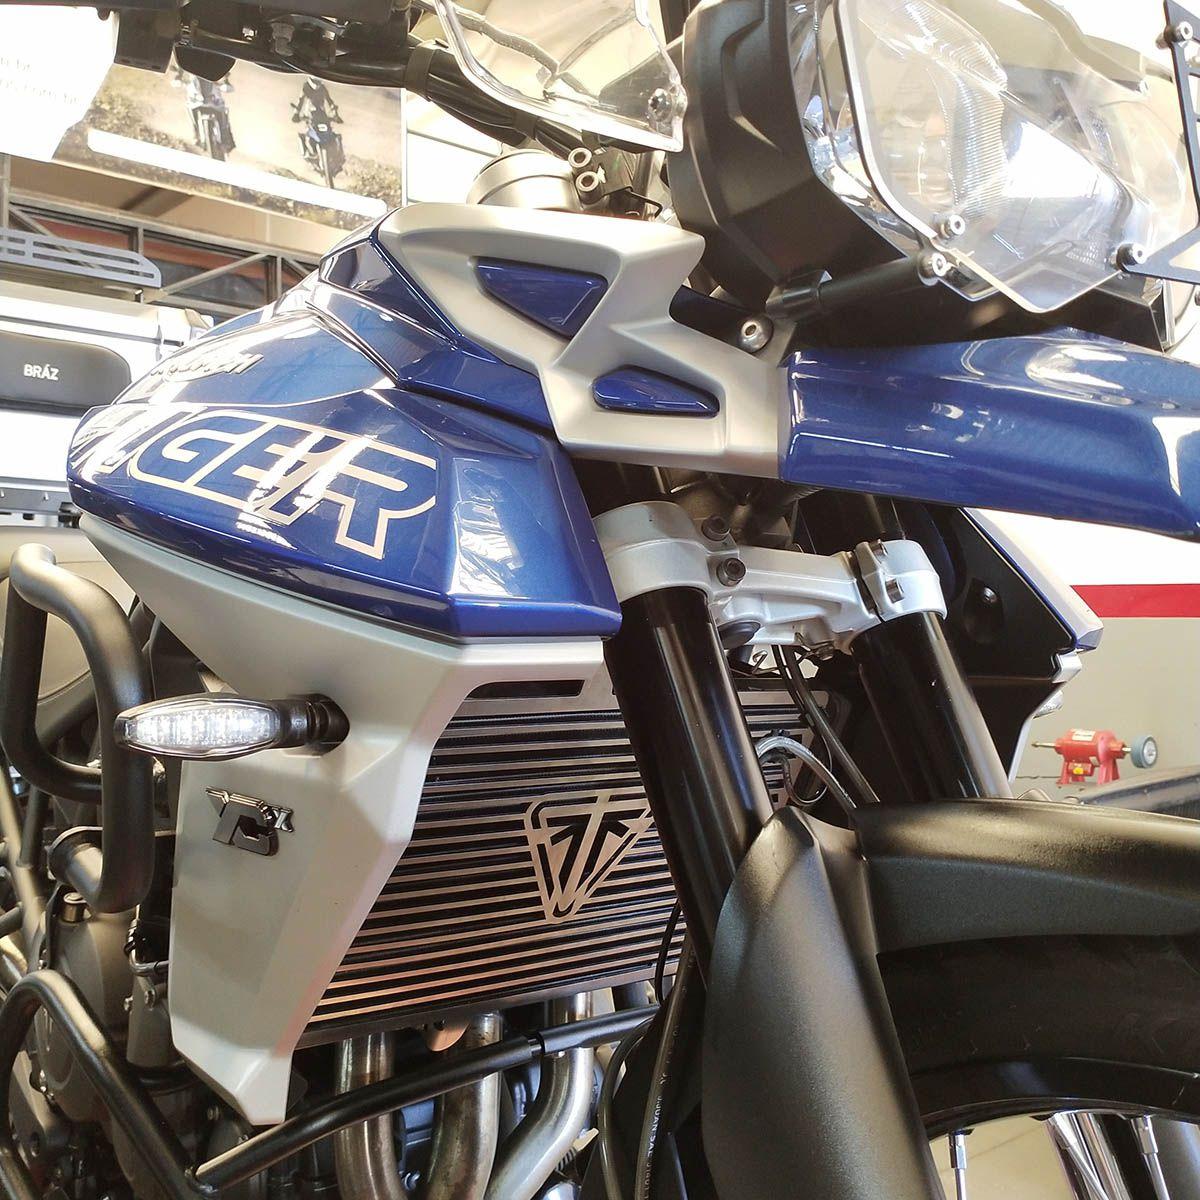 Protetor de Radiador Aço Inox Tiger 800 Bráz Acessórios  - Motorshopp